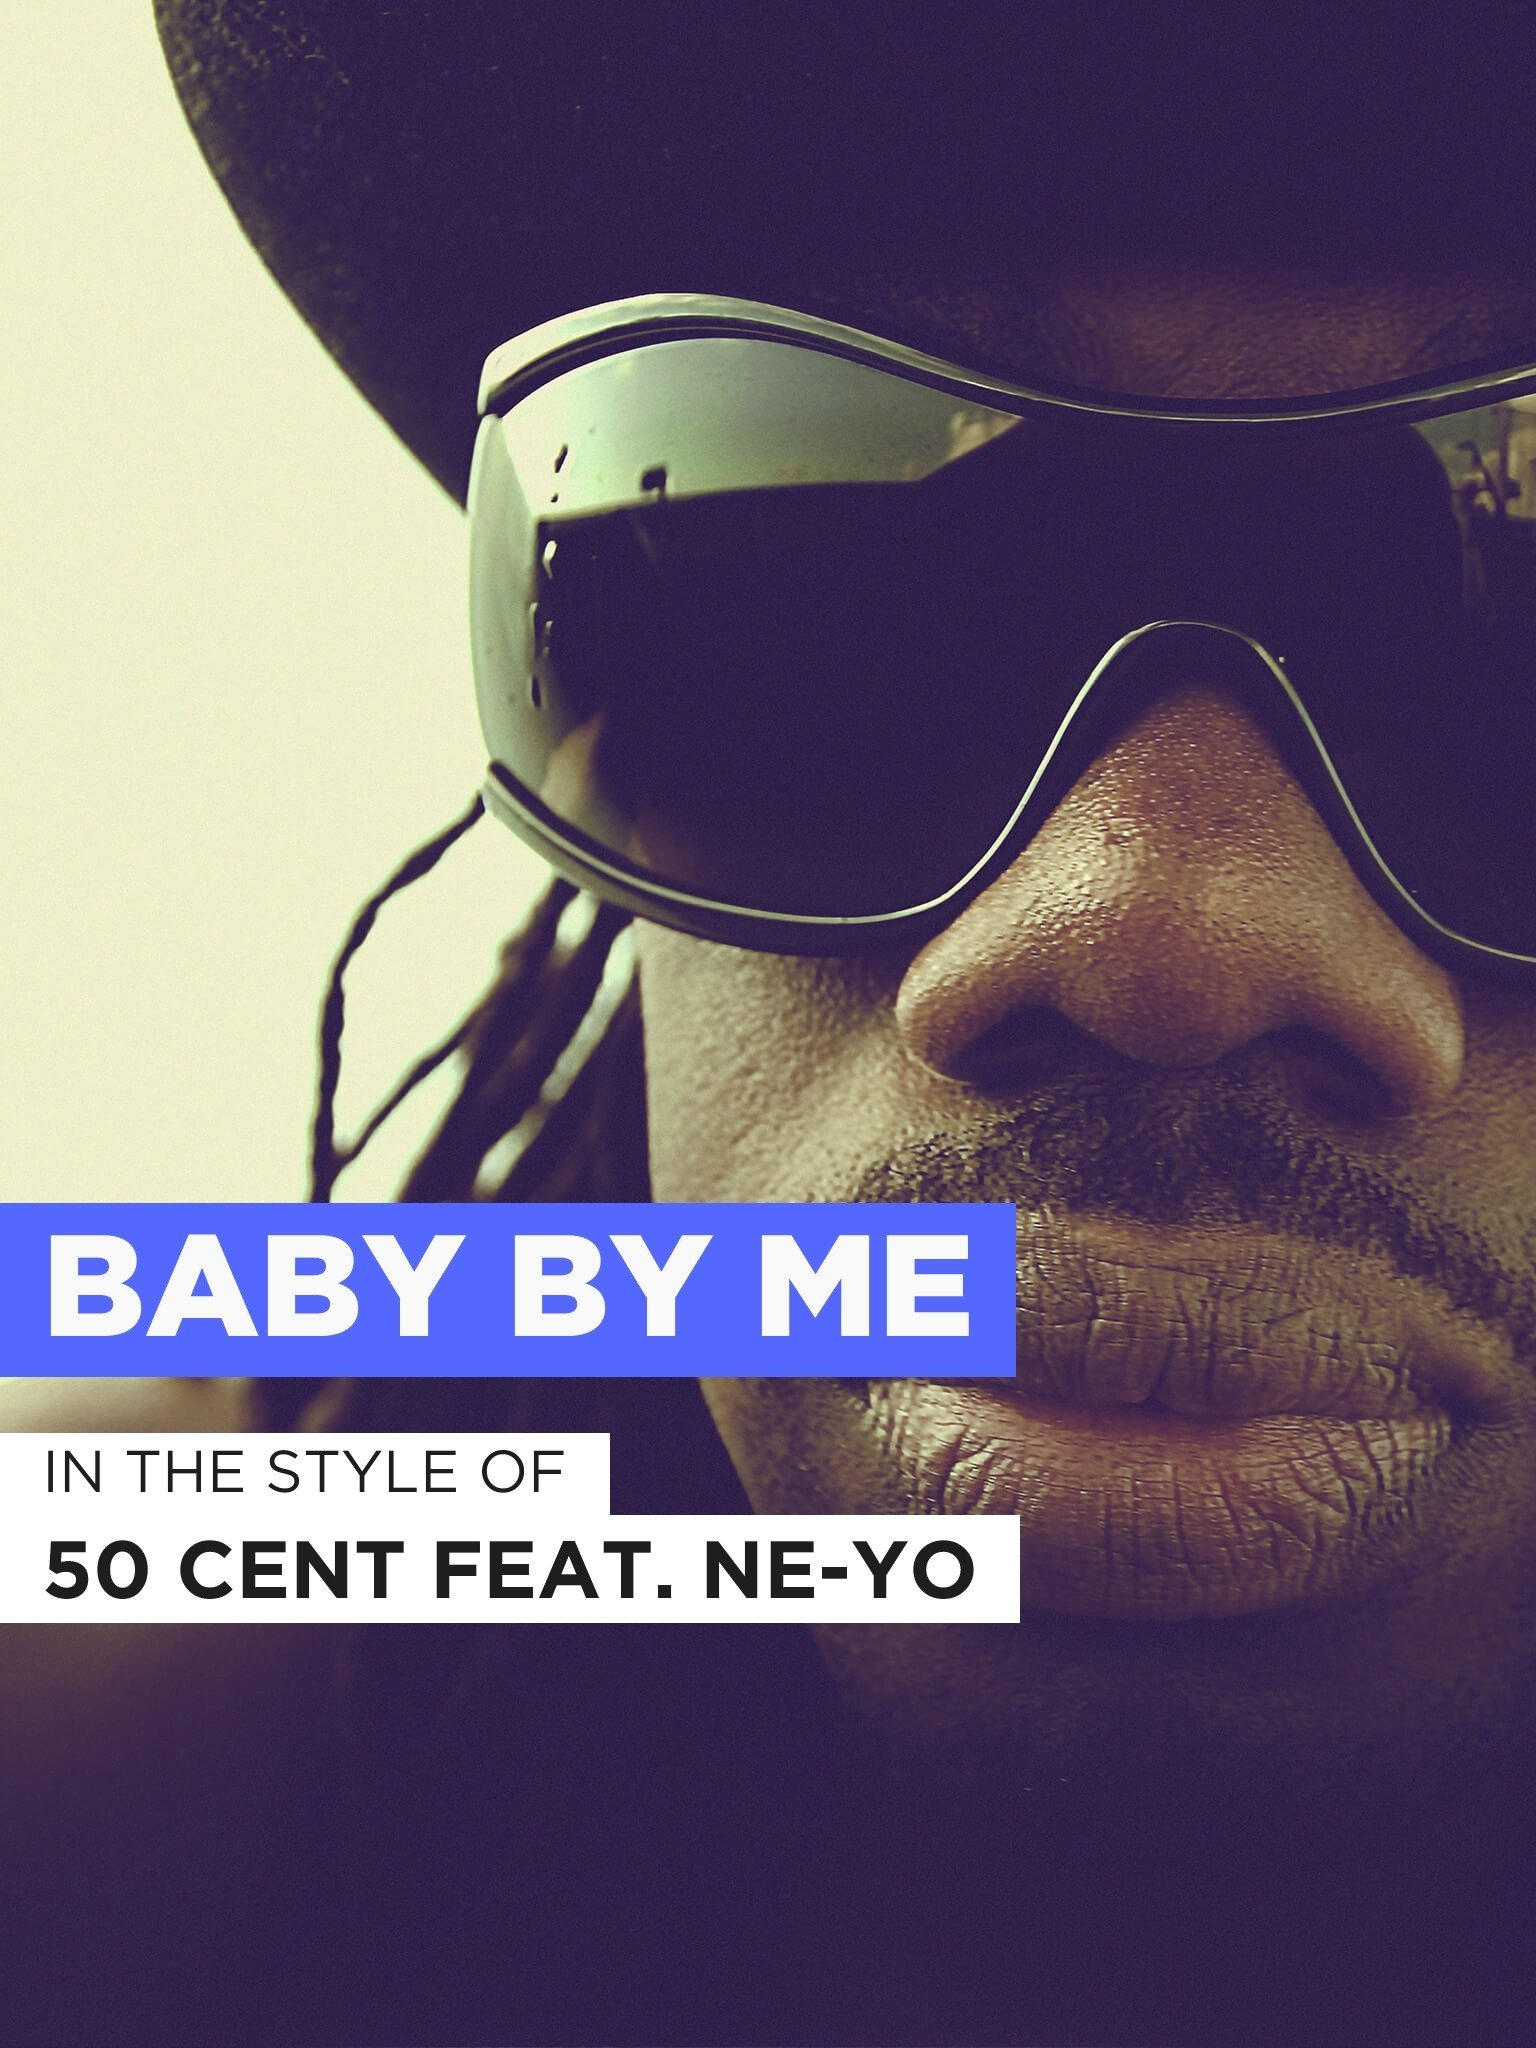 50 Cent Feat  Ne-Yo: Baby by Me (Video 2009) - IMDb